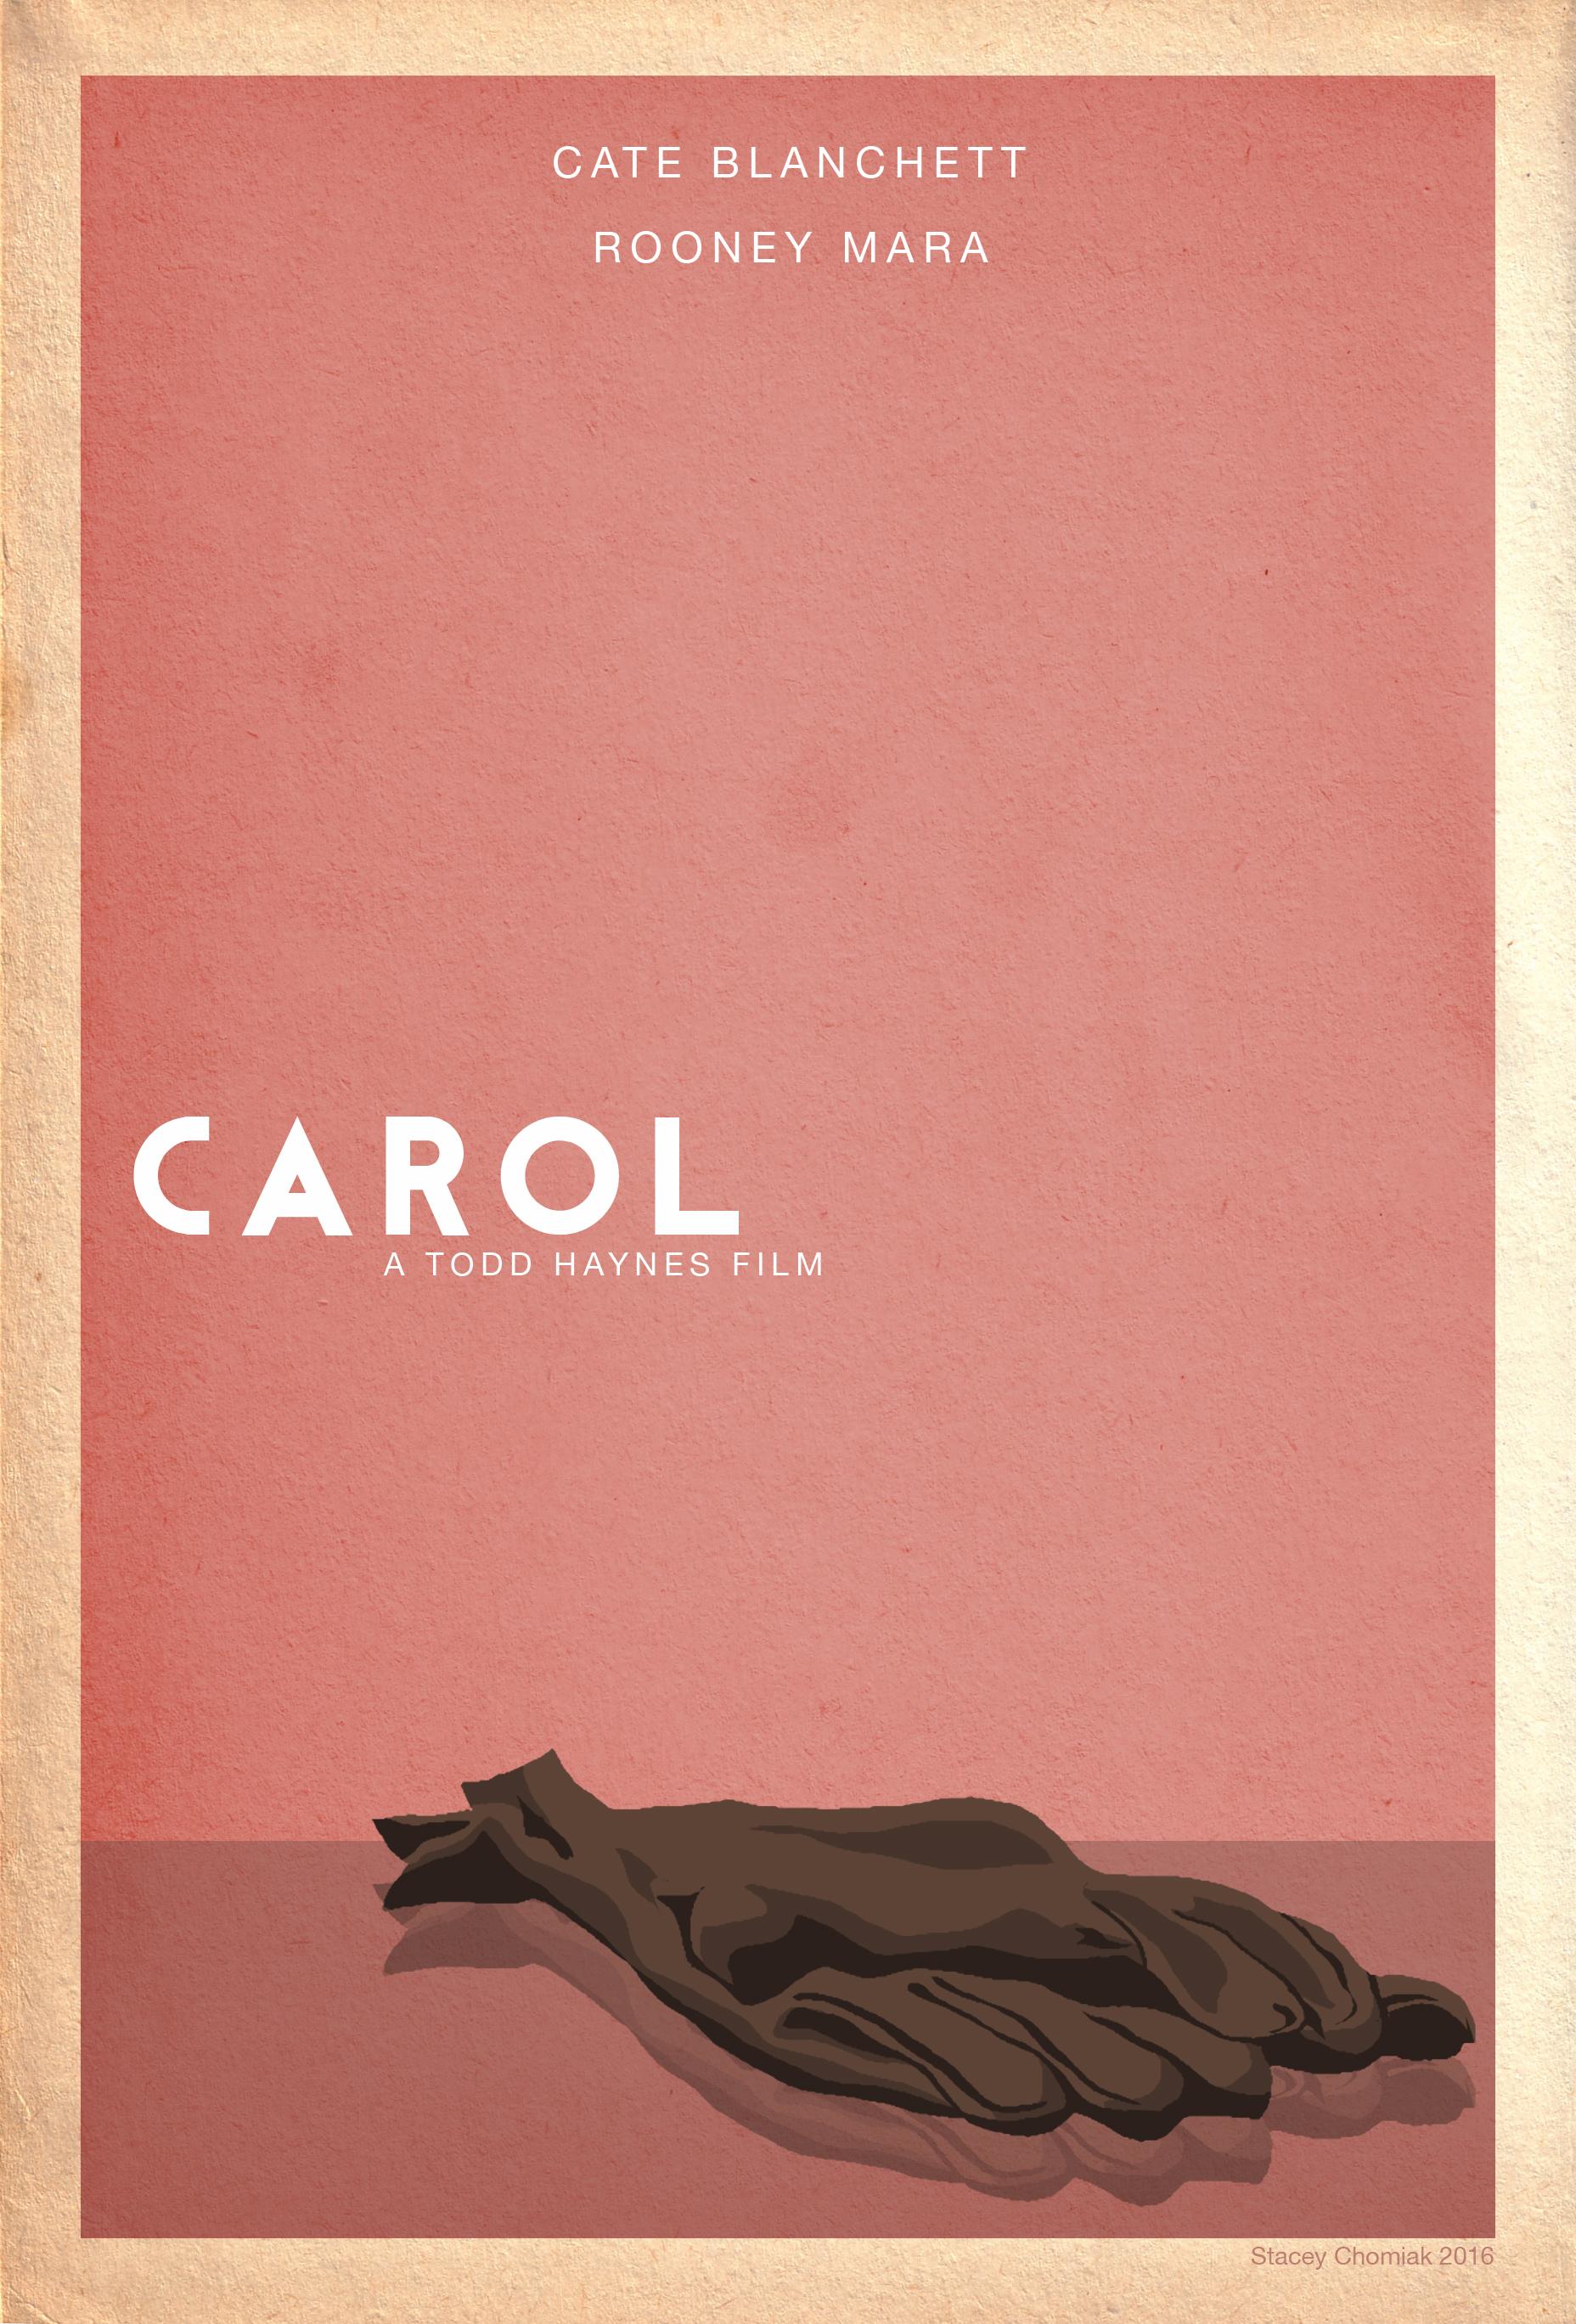 Poster design awards - Graphic Design